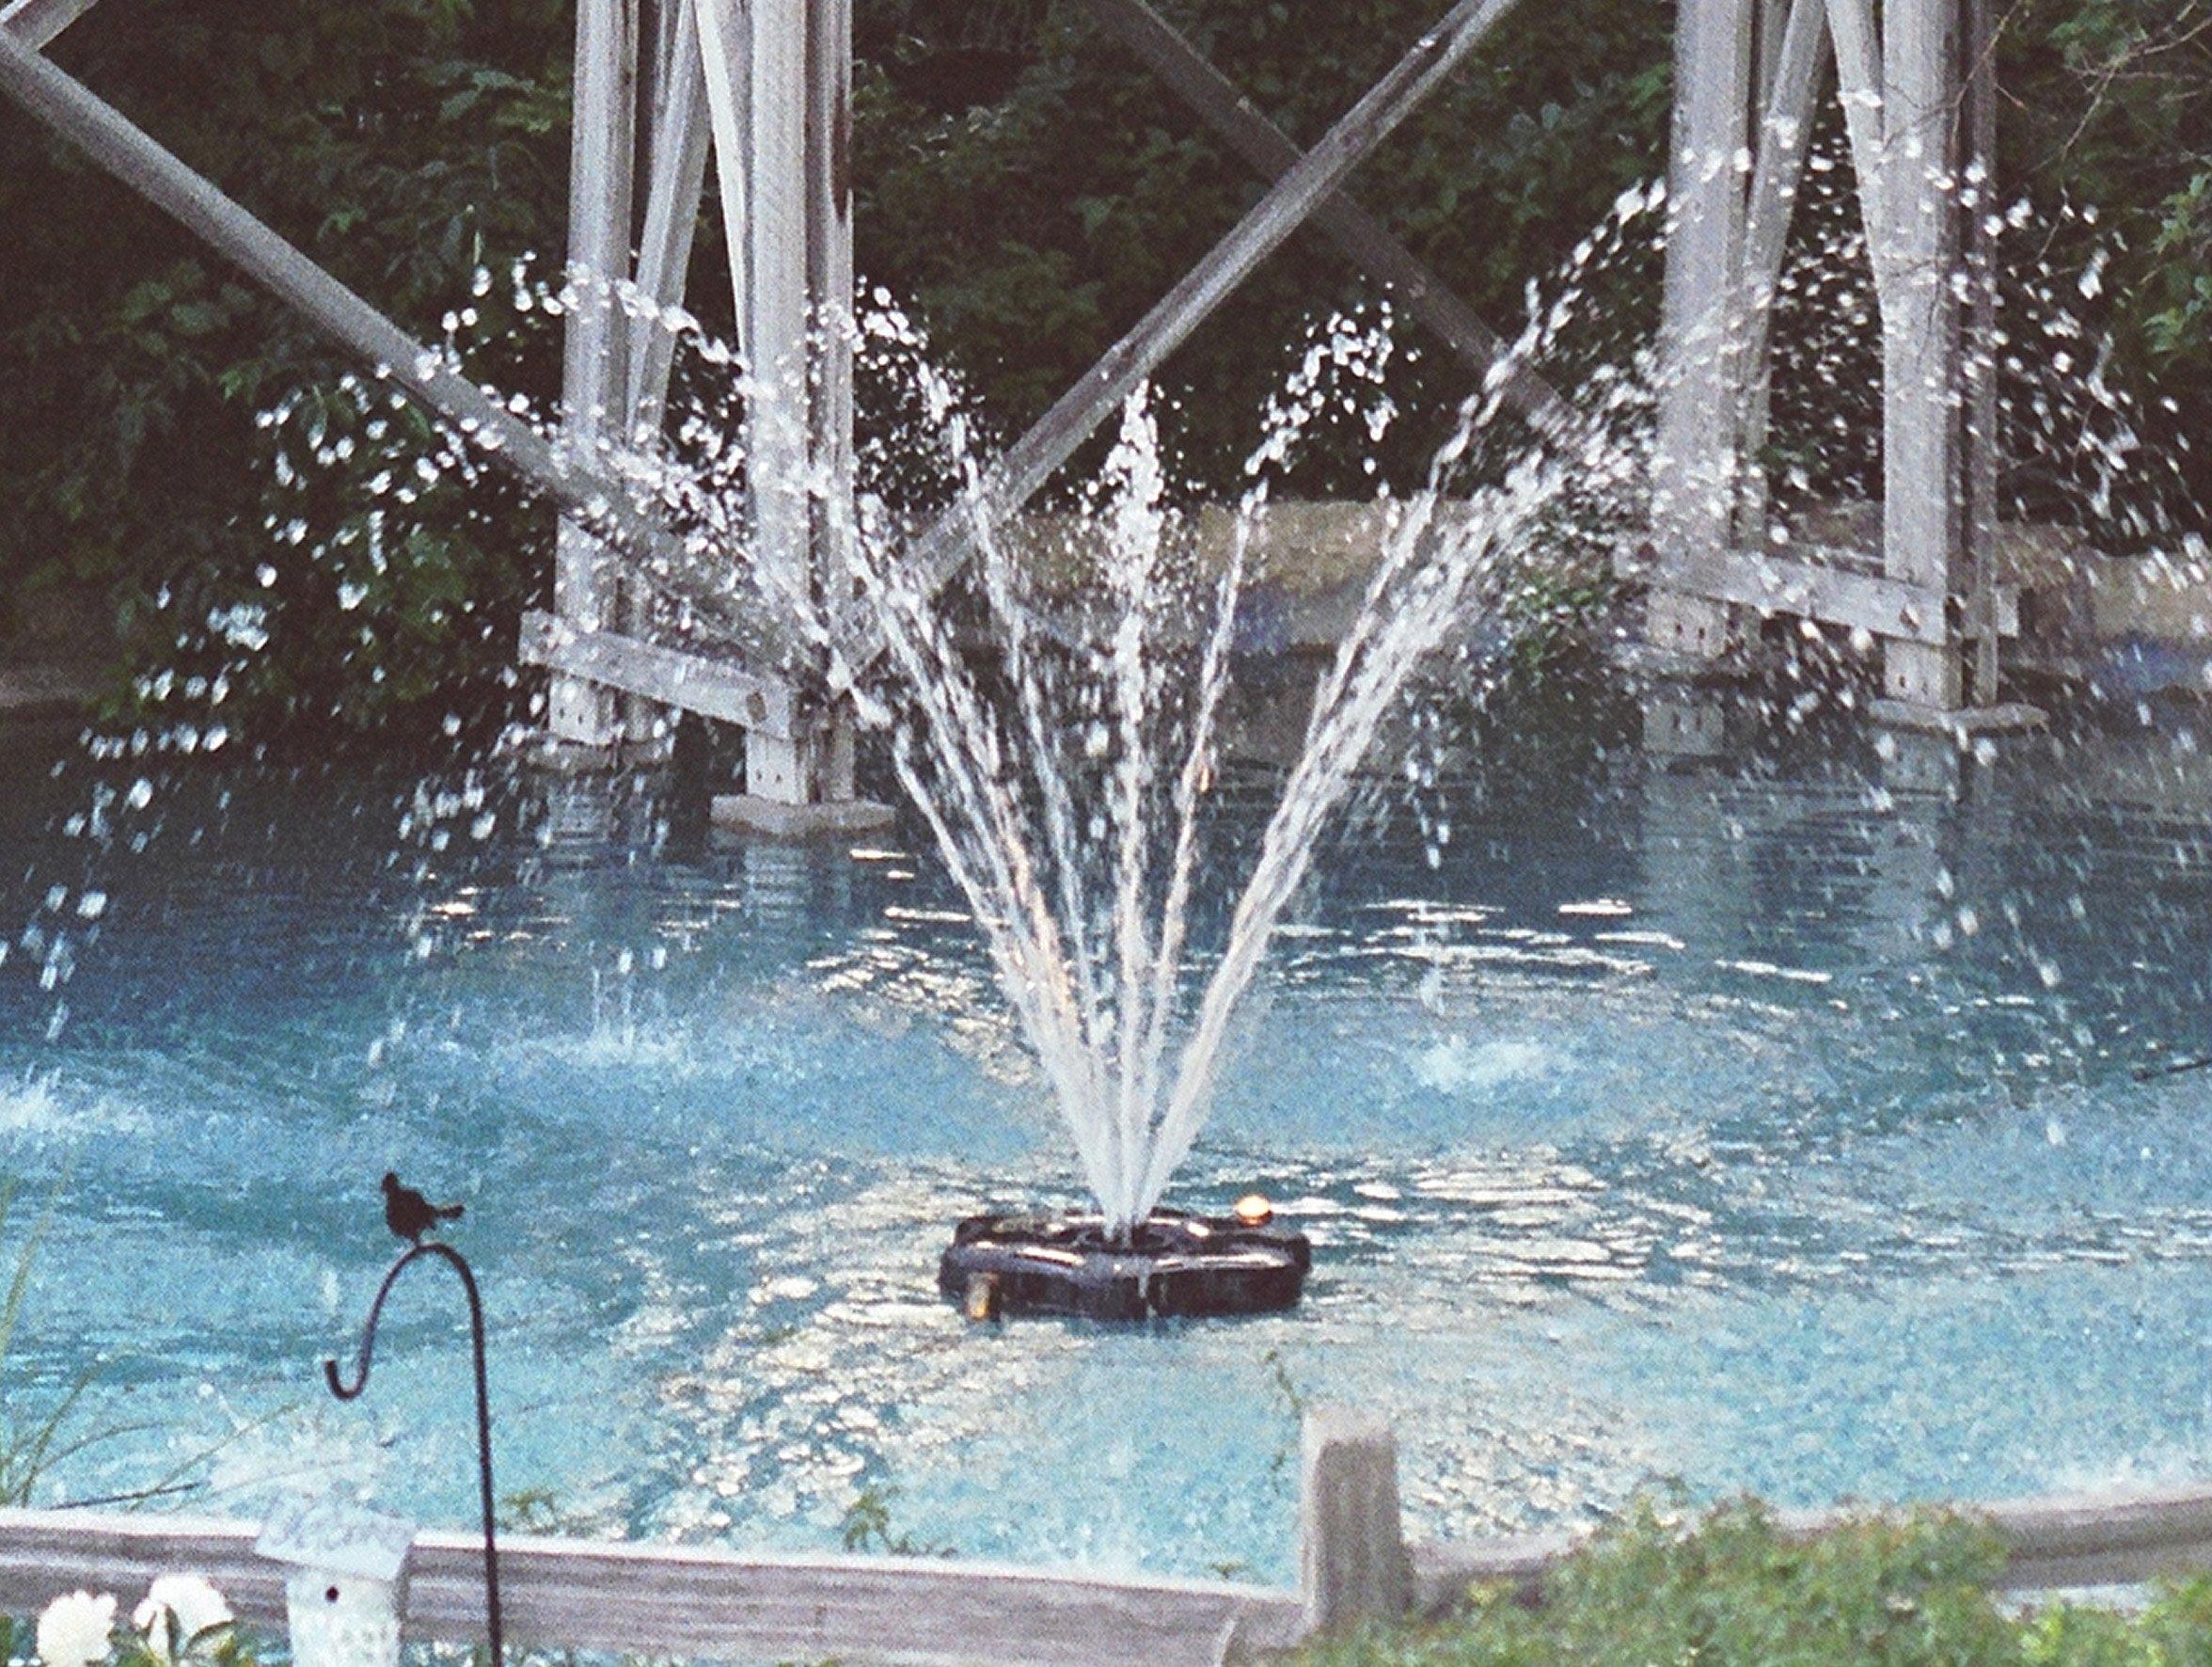 Kasco Aerating Fountain - 3/4 HP, 240V, 50ft. Cord, Model# 3400HJF050